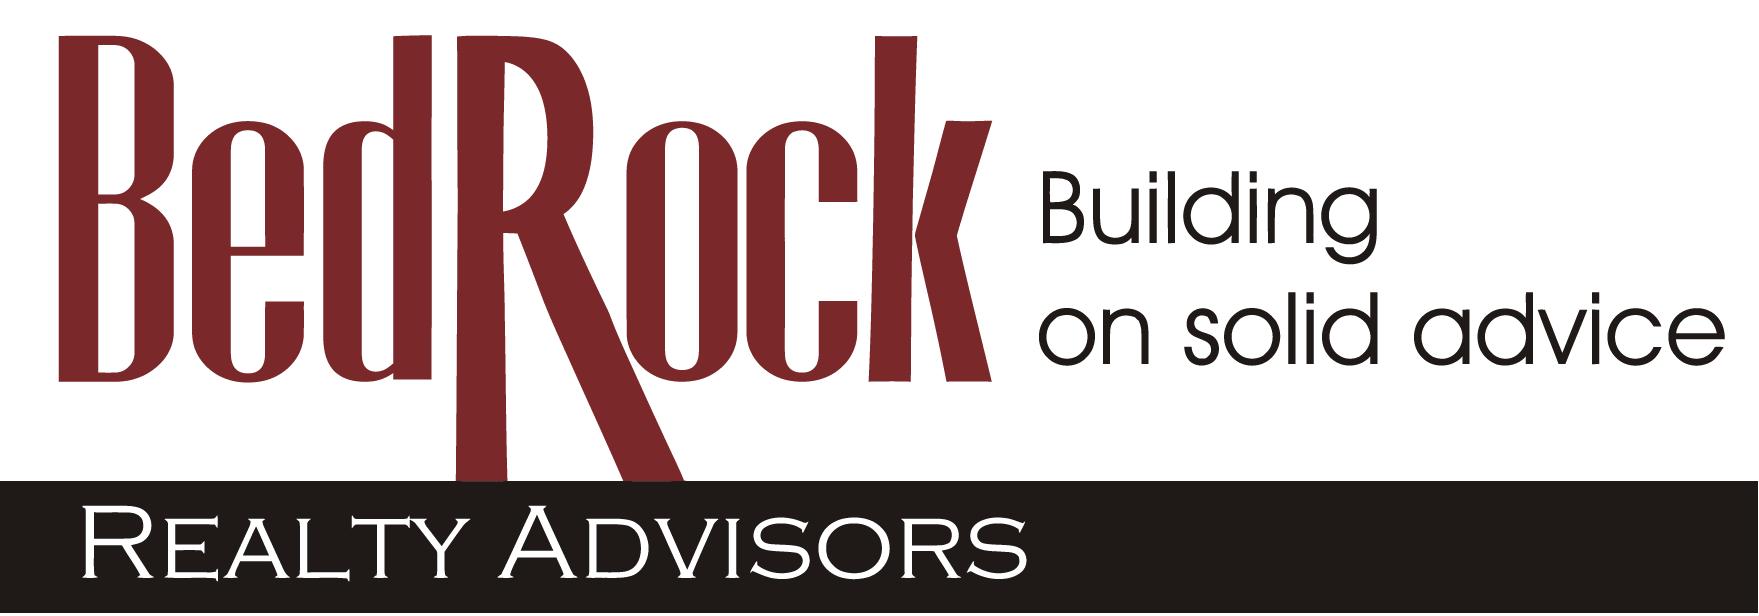 Bedrock Realty Advisors Inc.